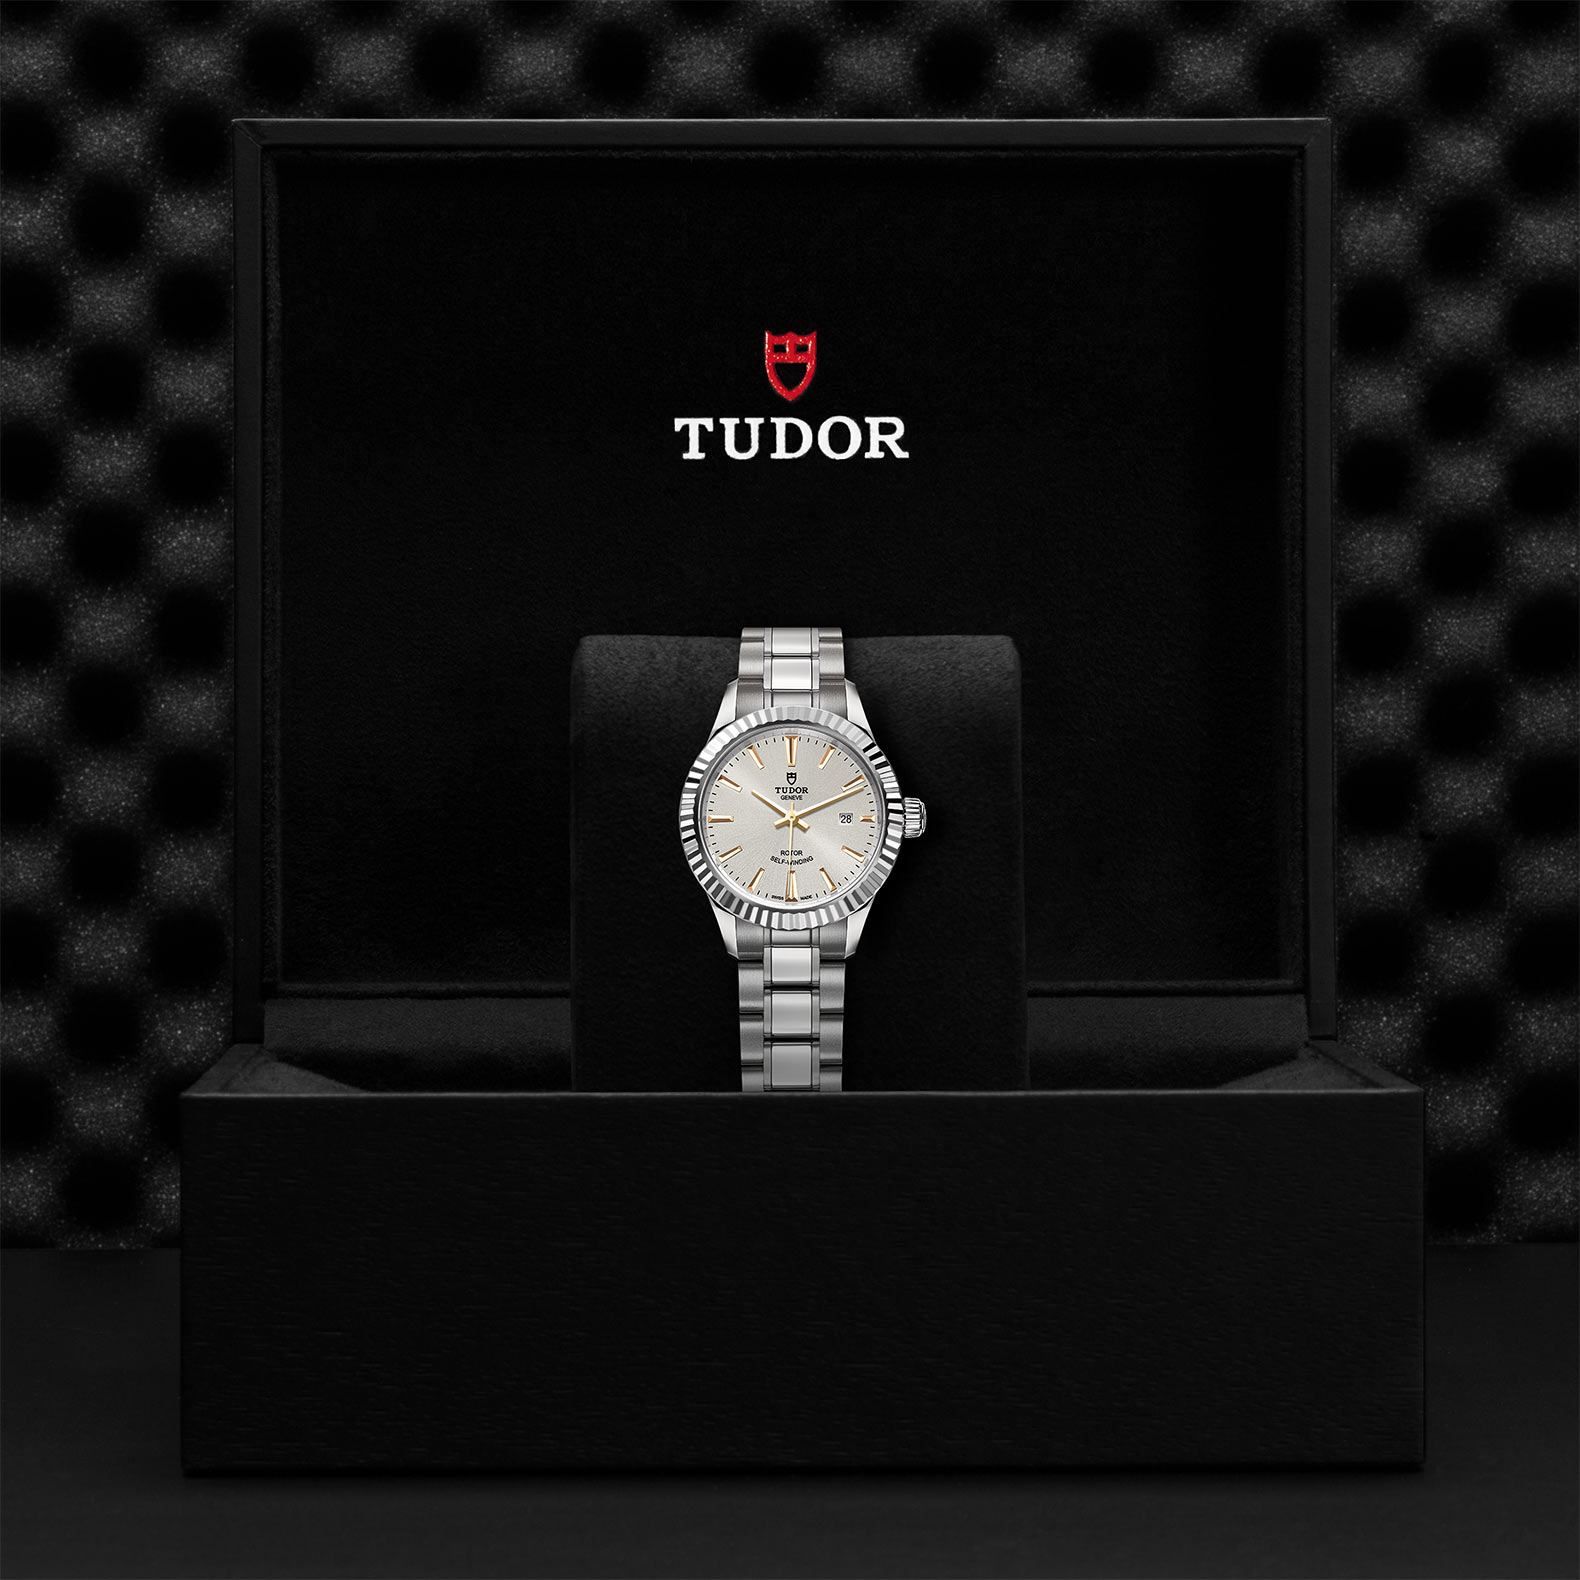 TUDOR Style M12110 0005 Presentationbox